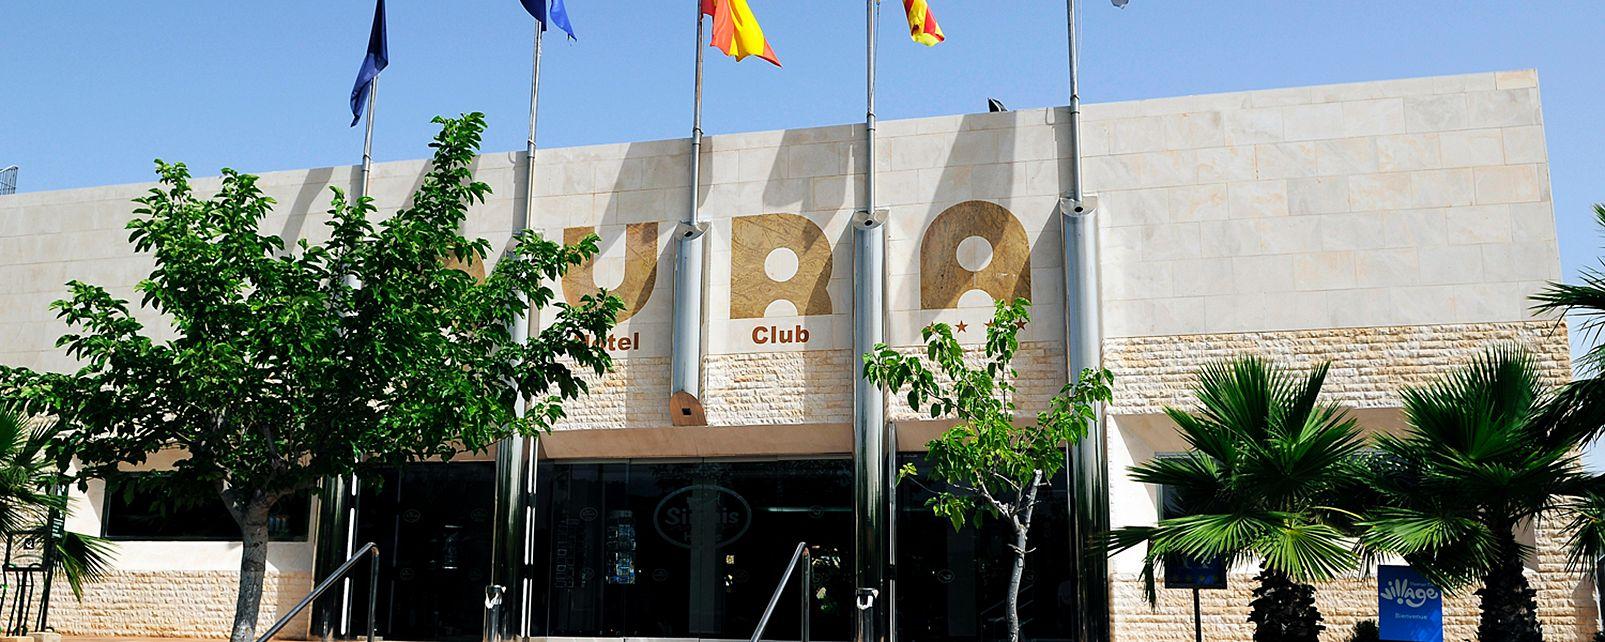 Hôtel Sirenis Club Aura